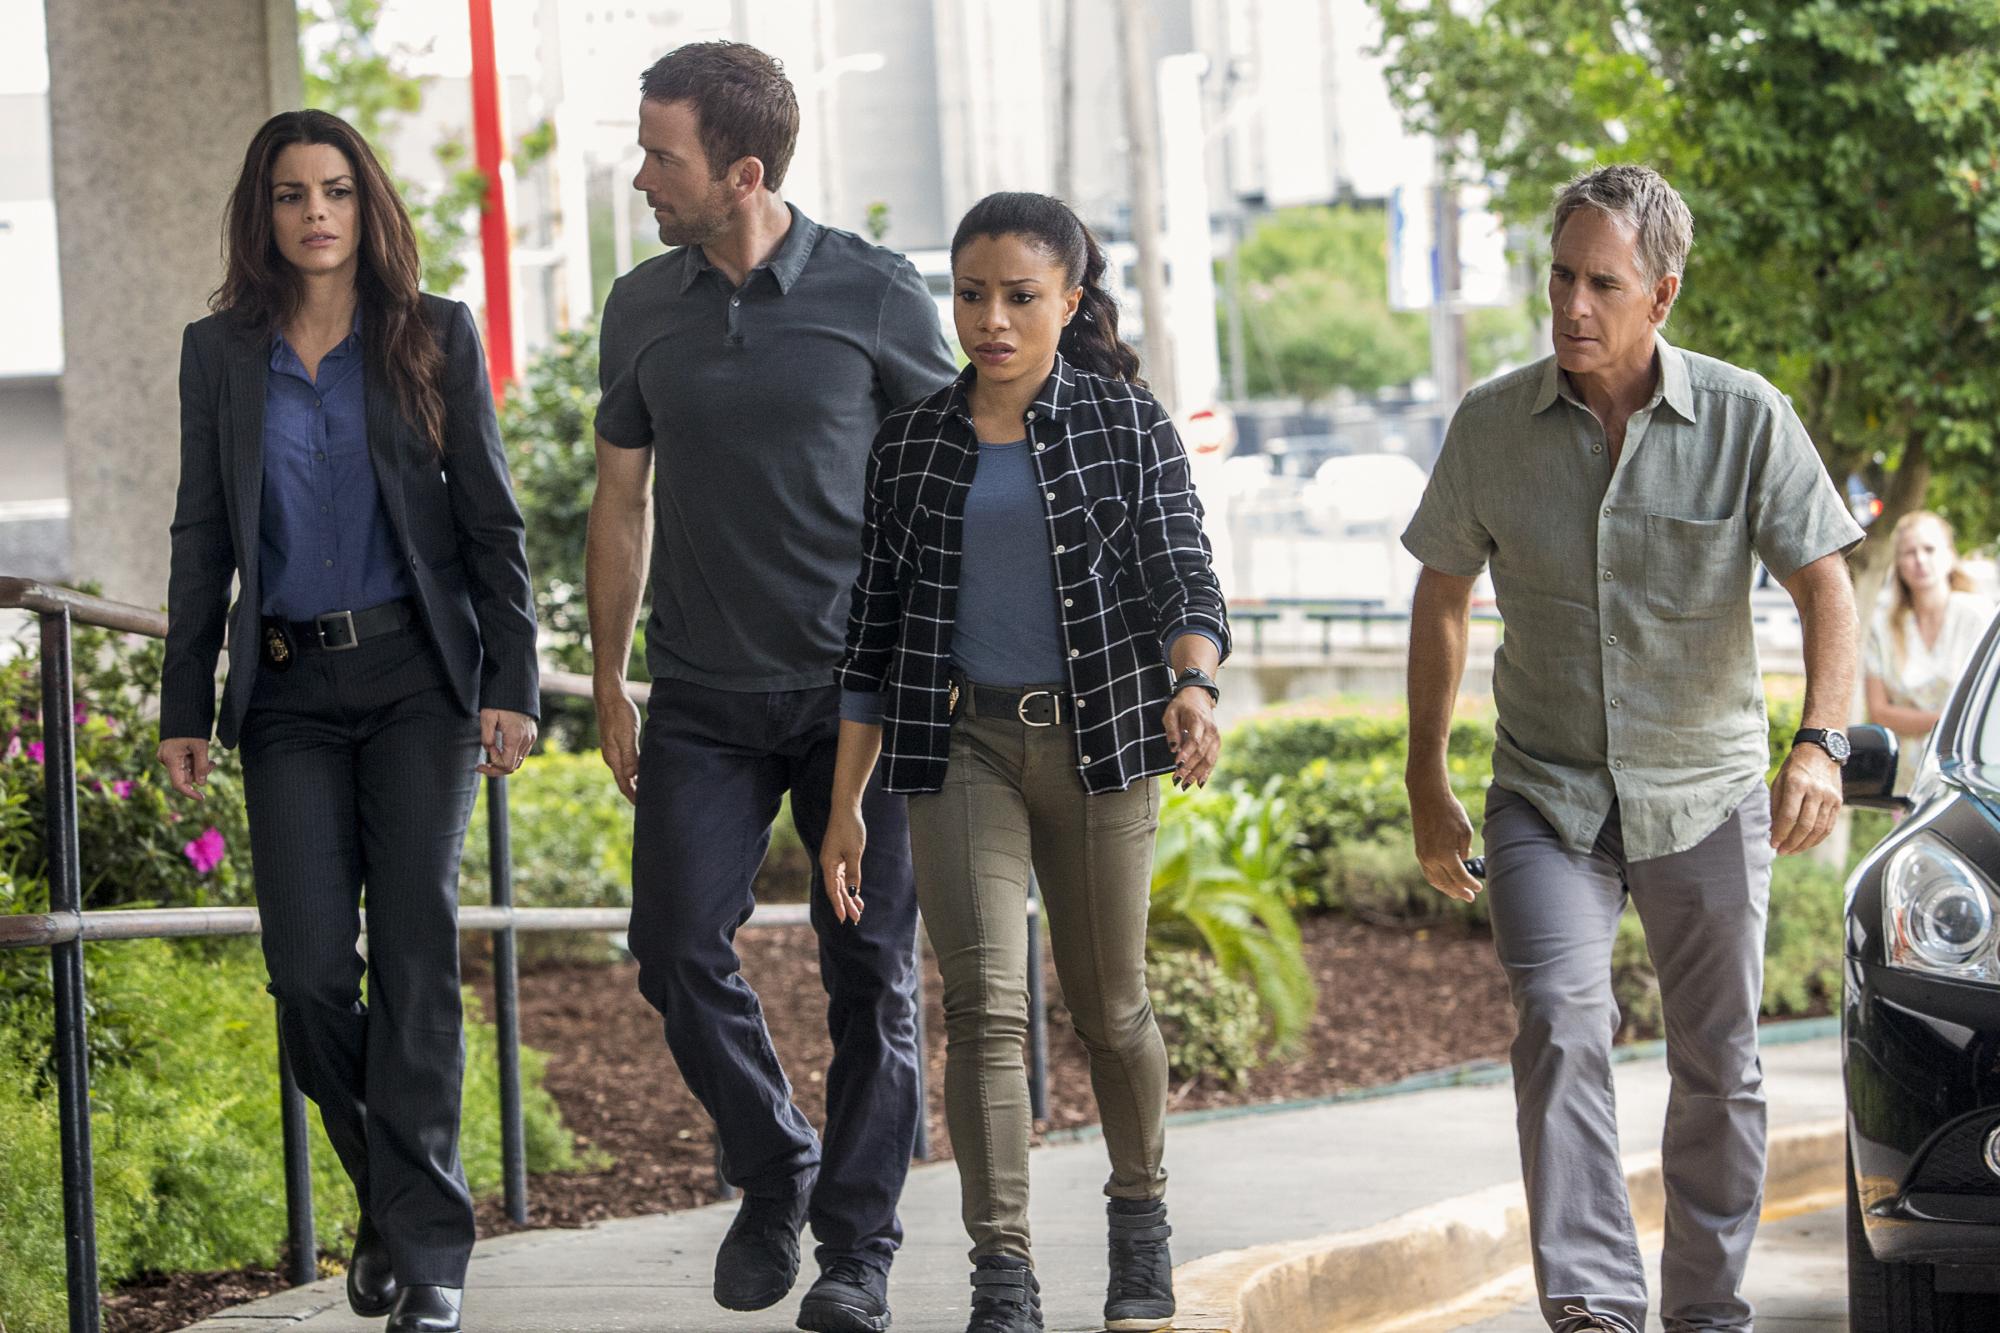 Vanessa Ferlito as FBI Agent Tammy Gregorio, Lucas Black as Special Agent Christopher Lasalle, Shalita Grant as Sonja Percy, and Scott Bakula as Special Agent Dwayne Pride